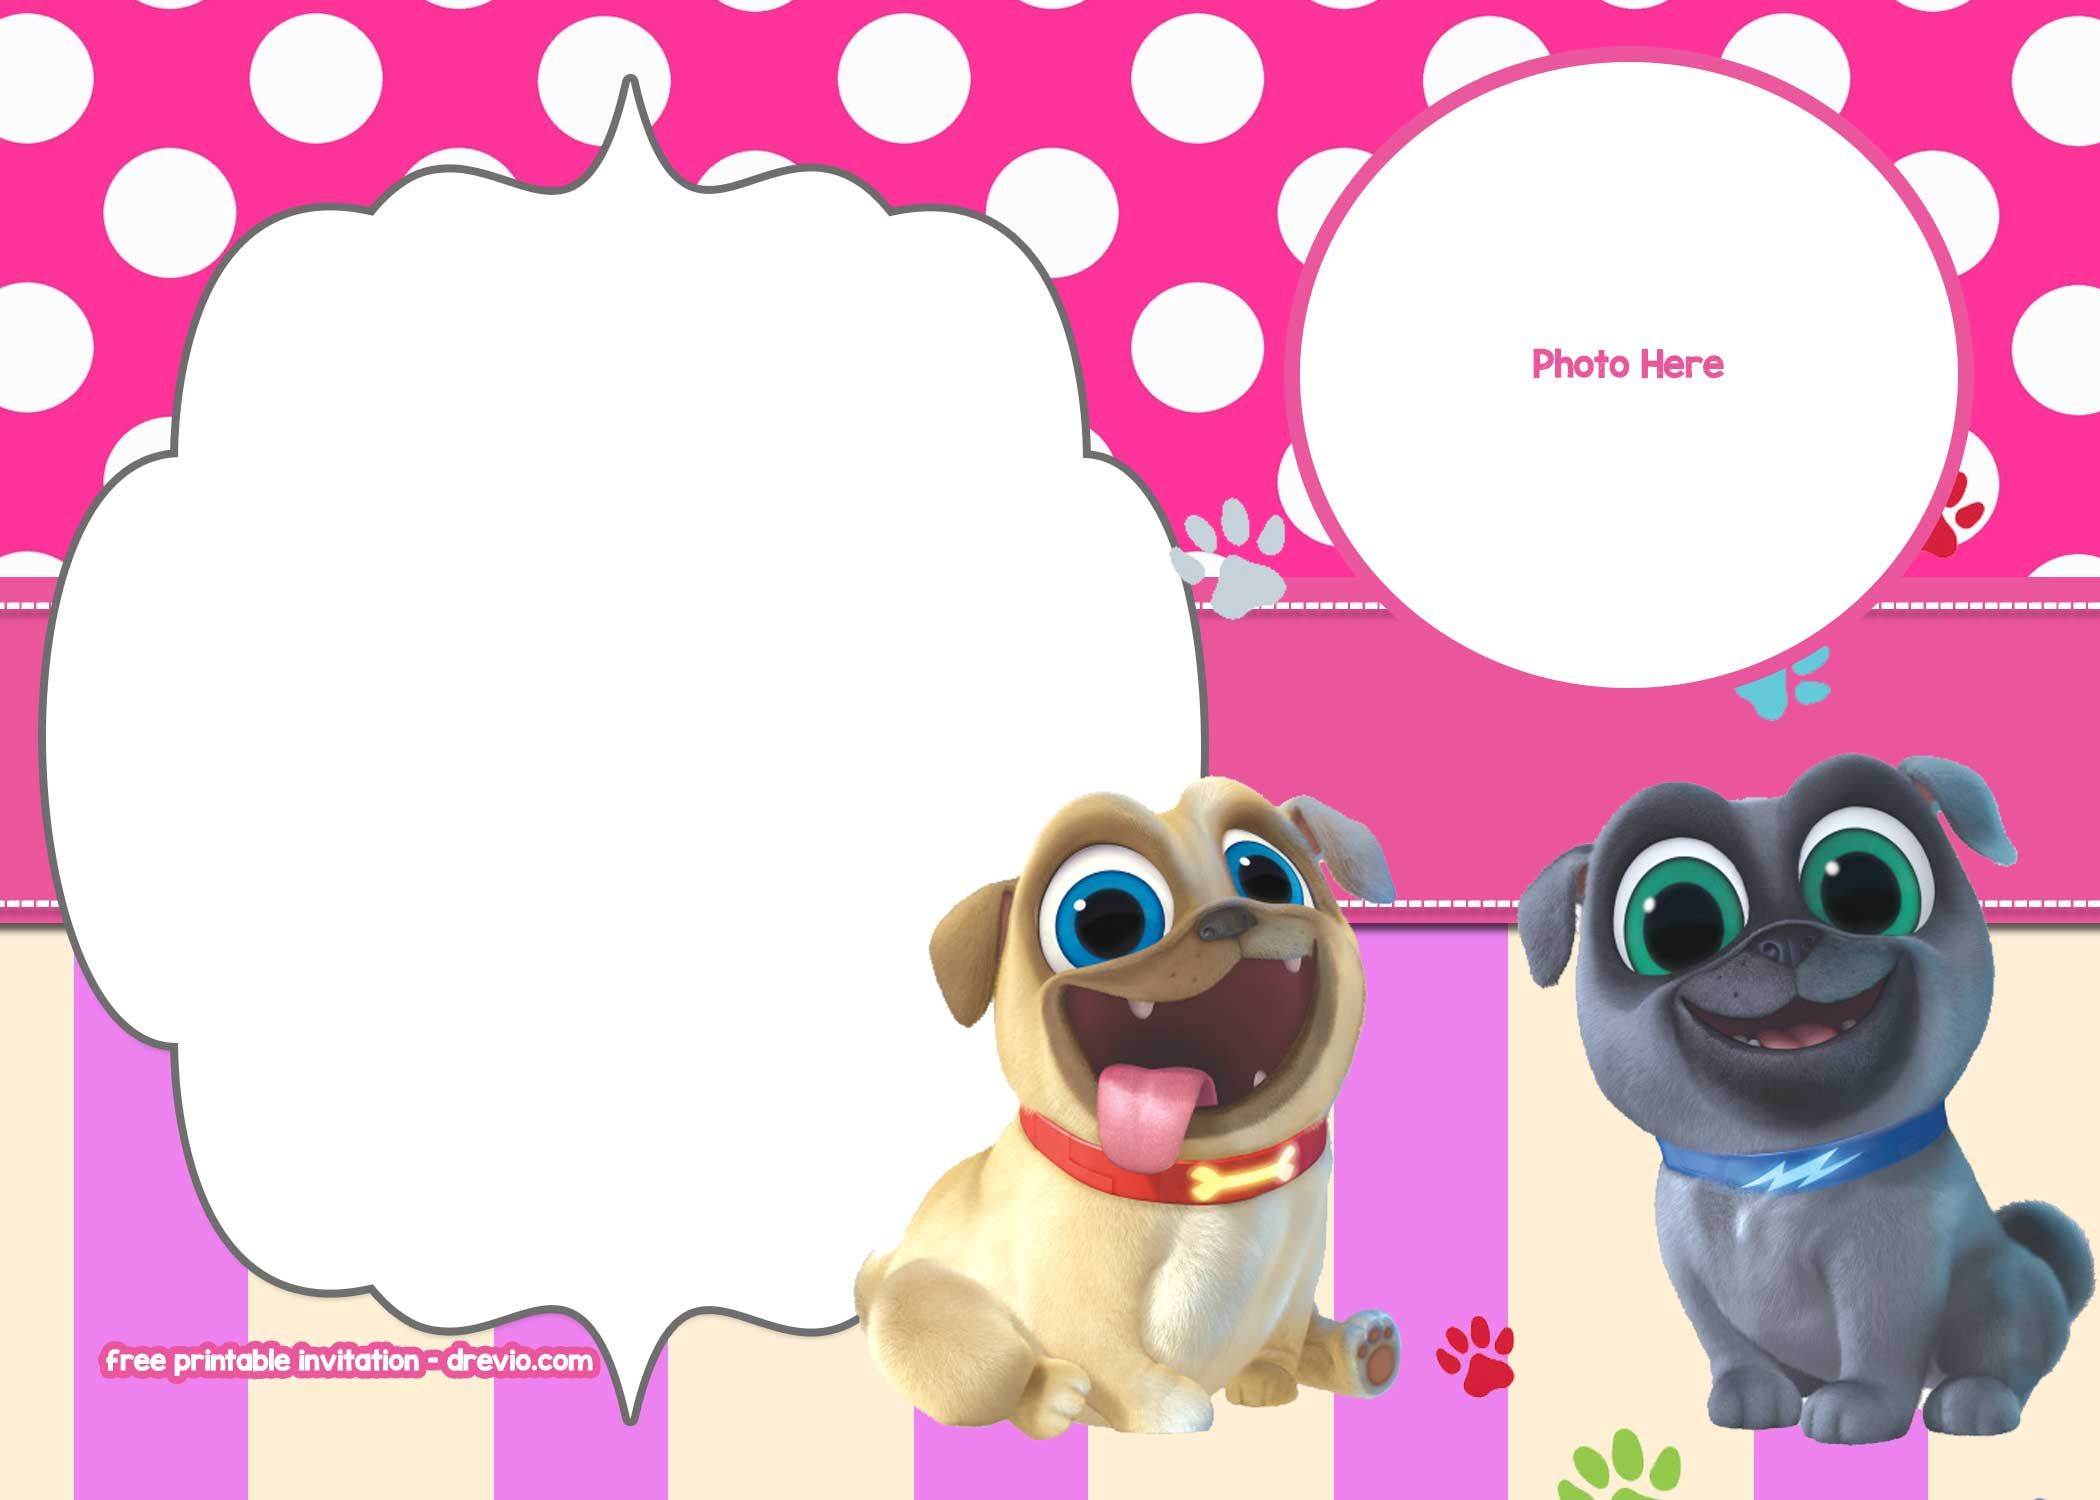 Free Disney Puppy Dog Pals Invitation Templates Drevio In 2020 Puppy Invitations Monsters Inc Invitations Paw Patrol Invitations